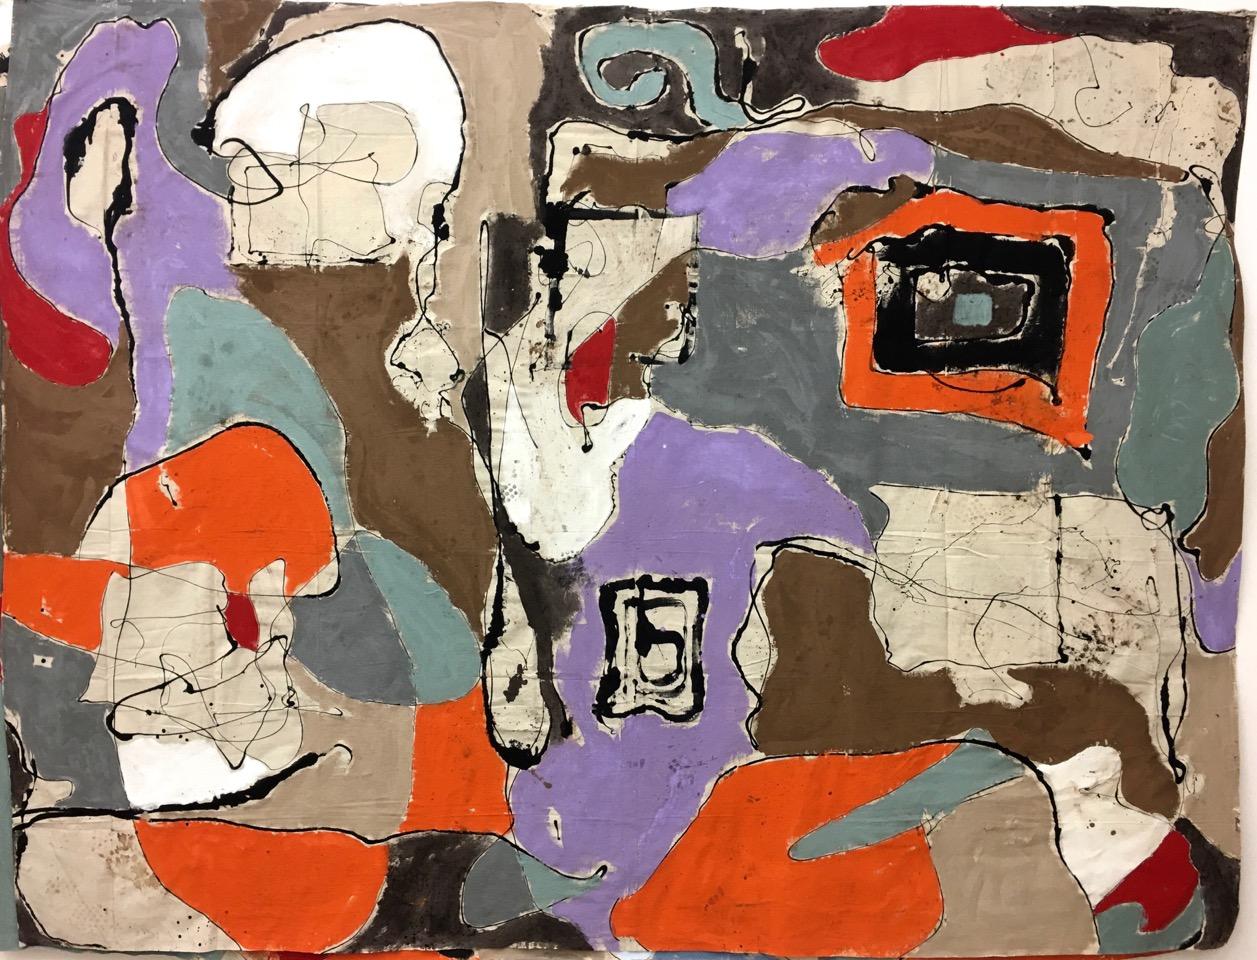 "104"" x 138"" Latex Paint, Walnut Stain on Canvas Drop Cloth 2020"